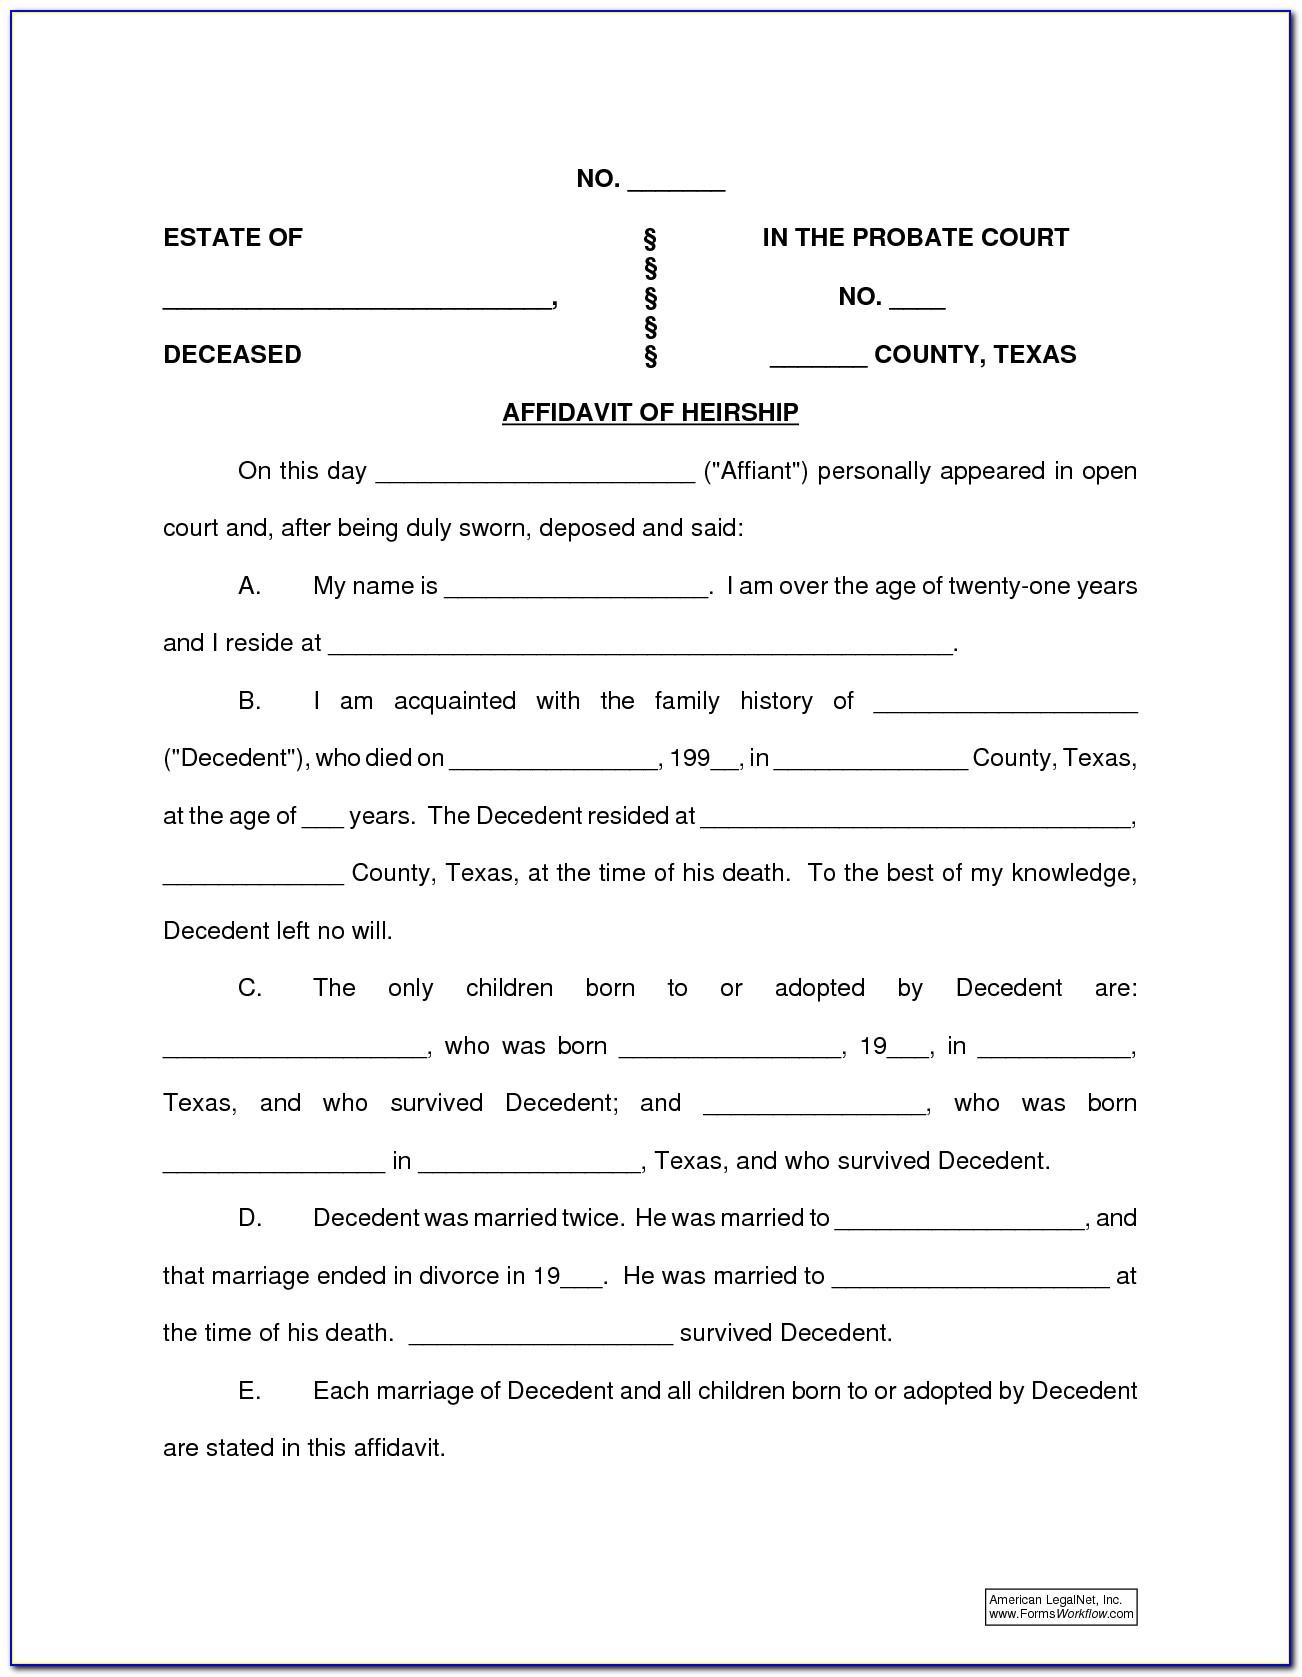 Texas Probate Forms Affidavit Of Heirship